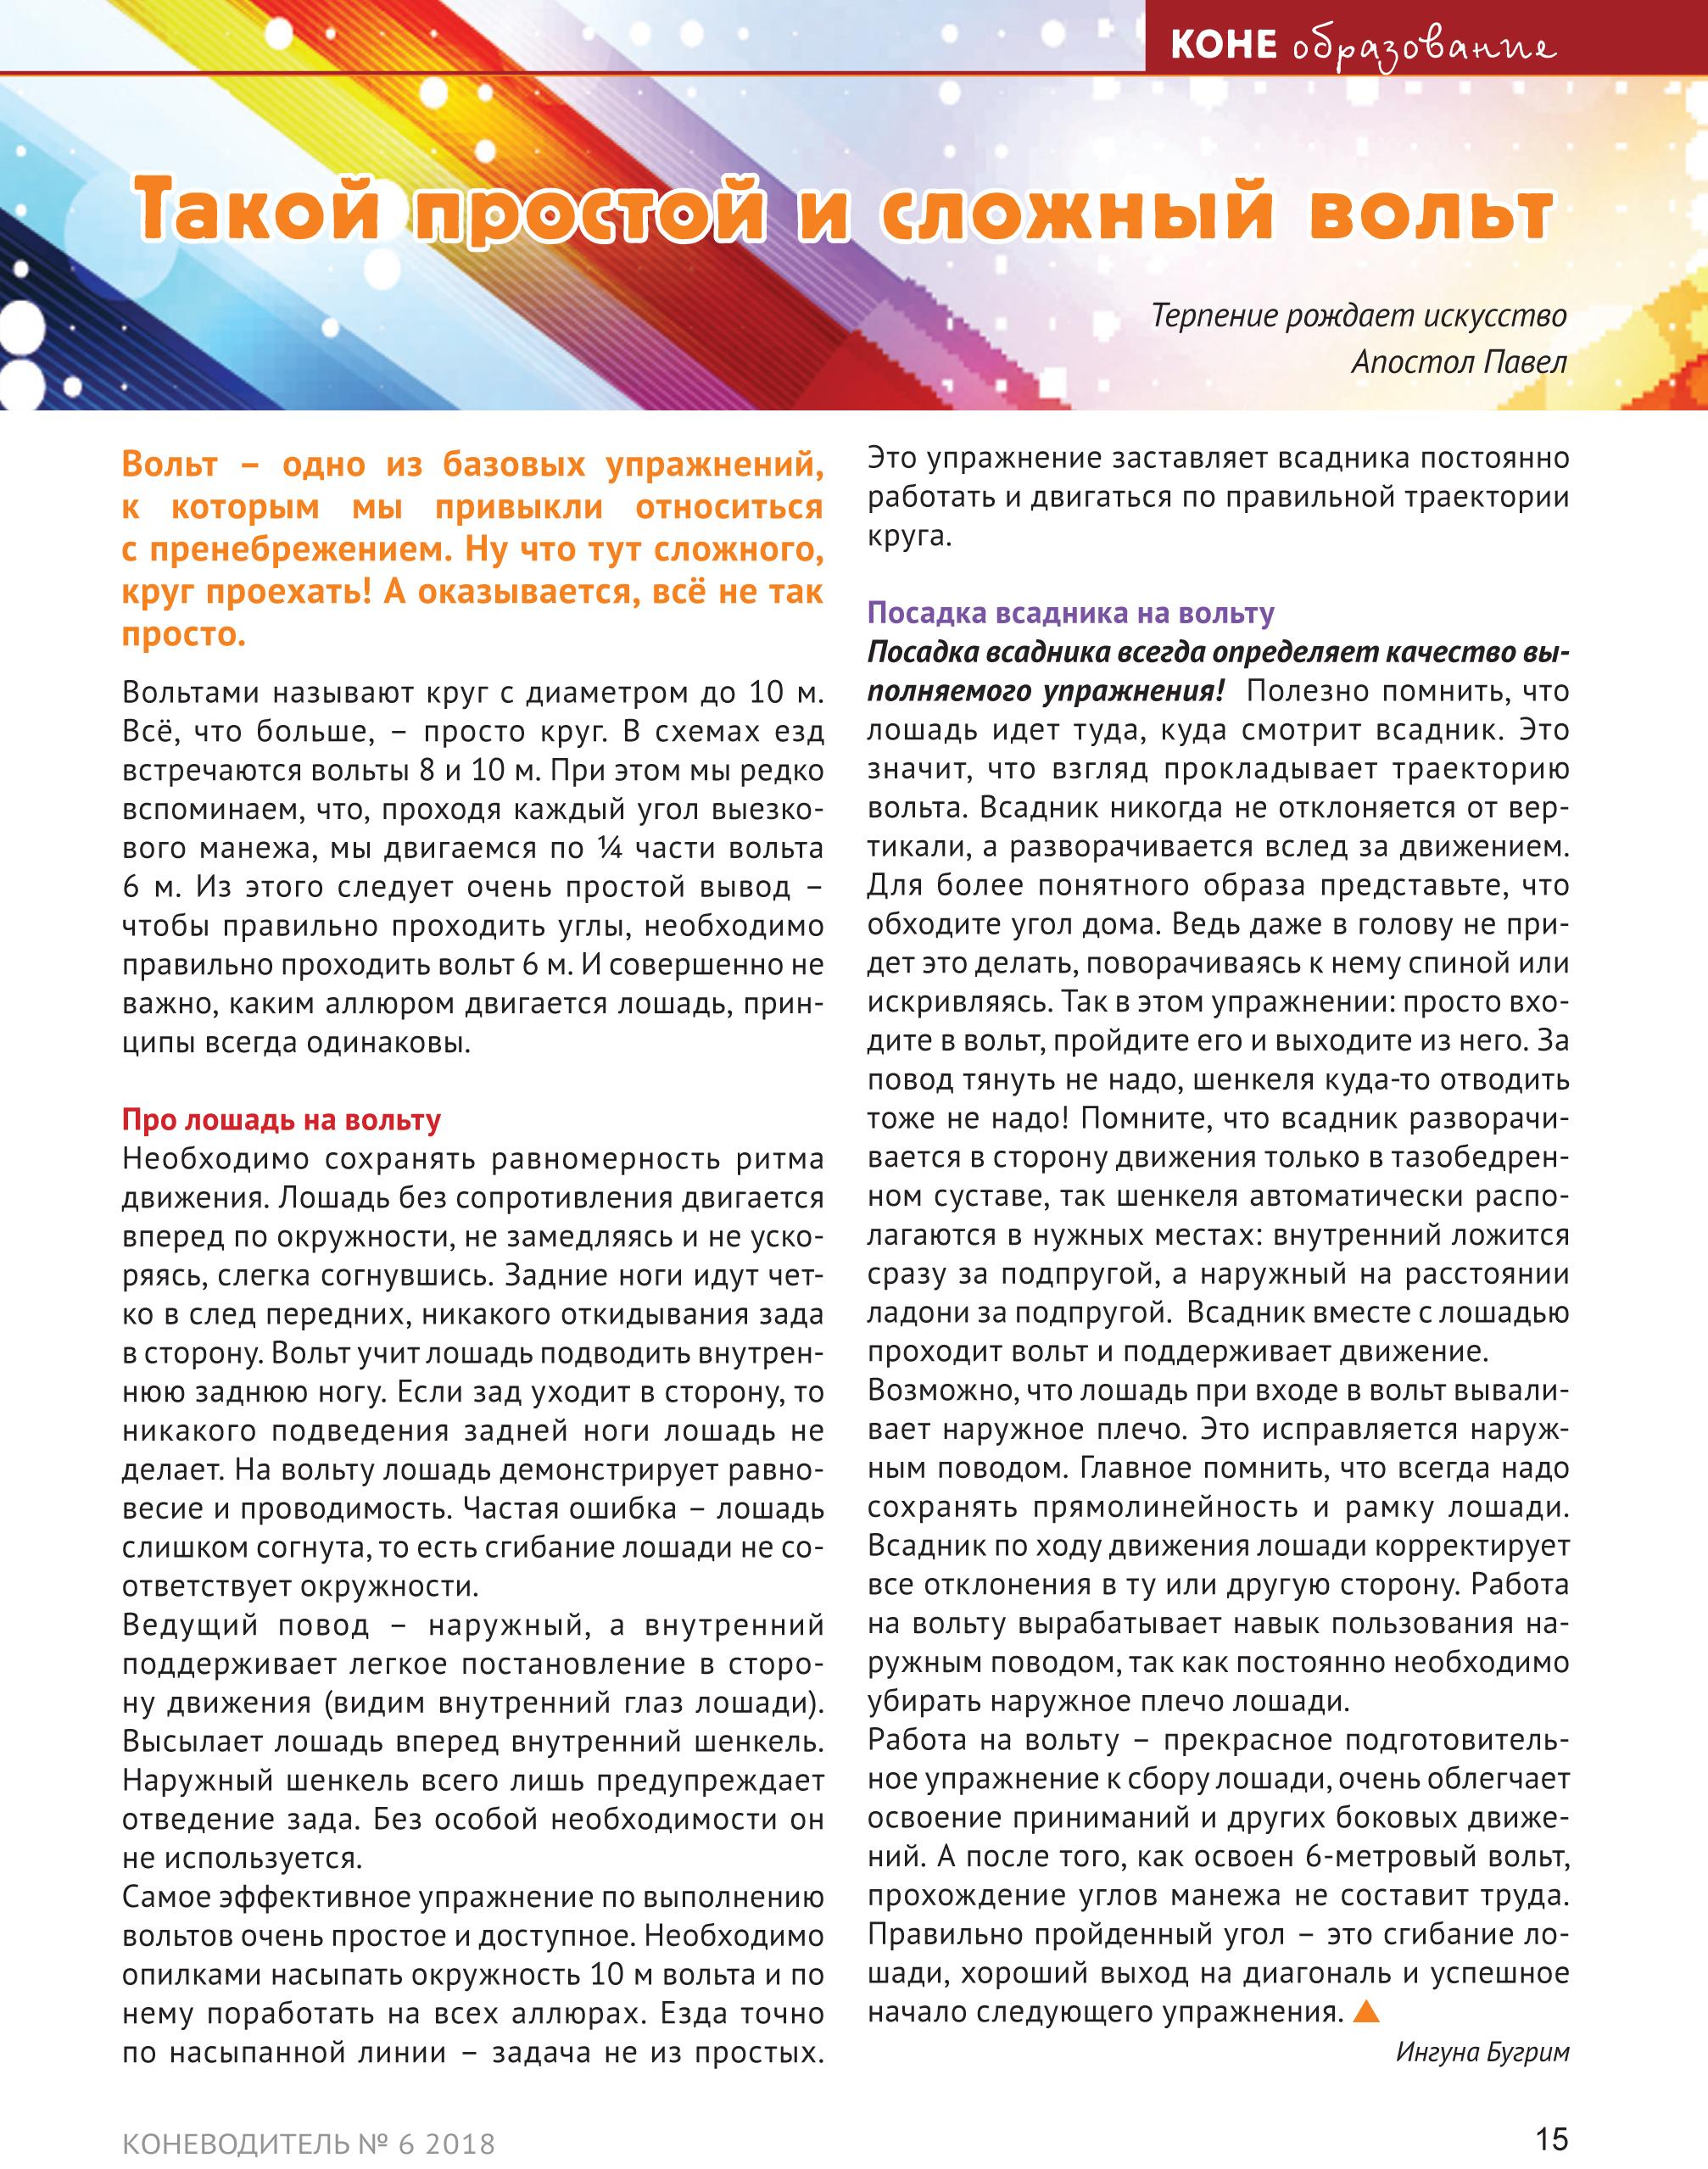 Book KONEVODITEL 62018 print-15